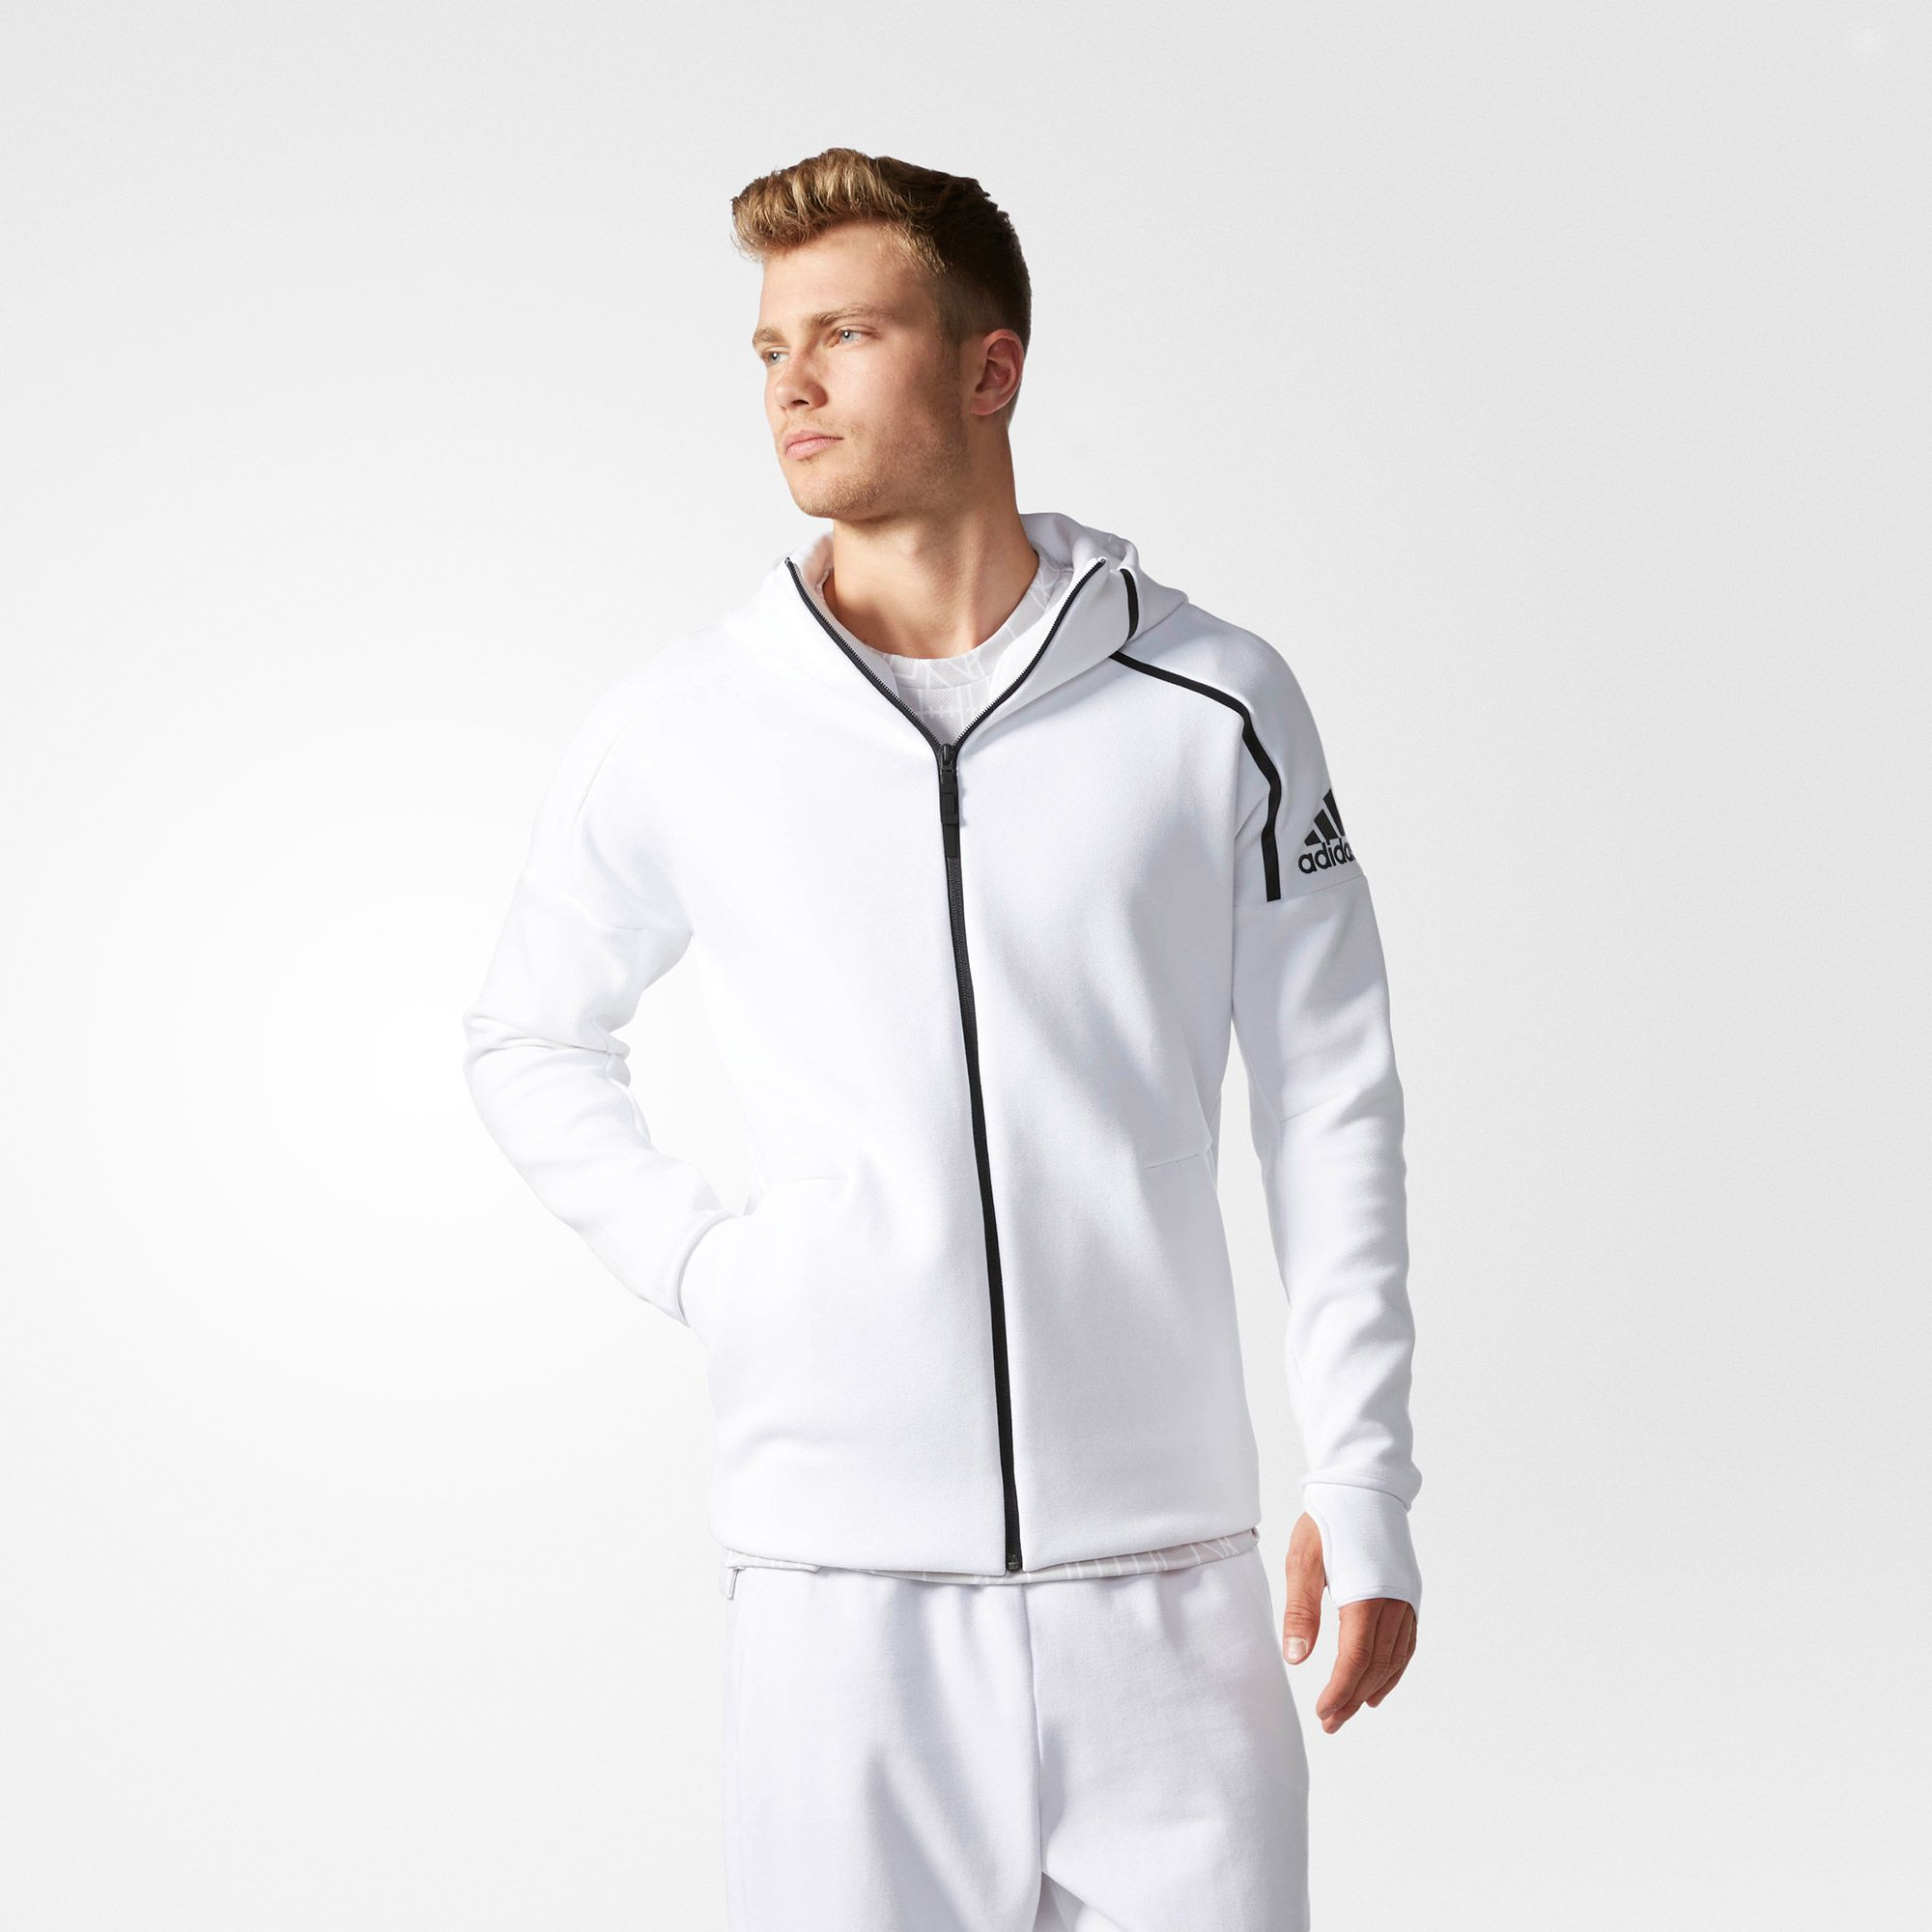 Vacante orgánico Comparar  Adidas Mens ZNE Hoodie Zip Up Jacket B48878 Negative Engergy ...